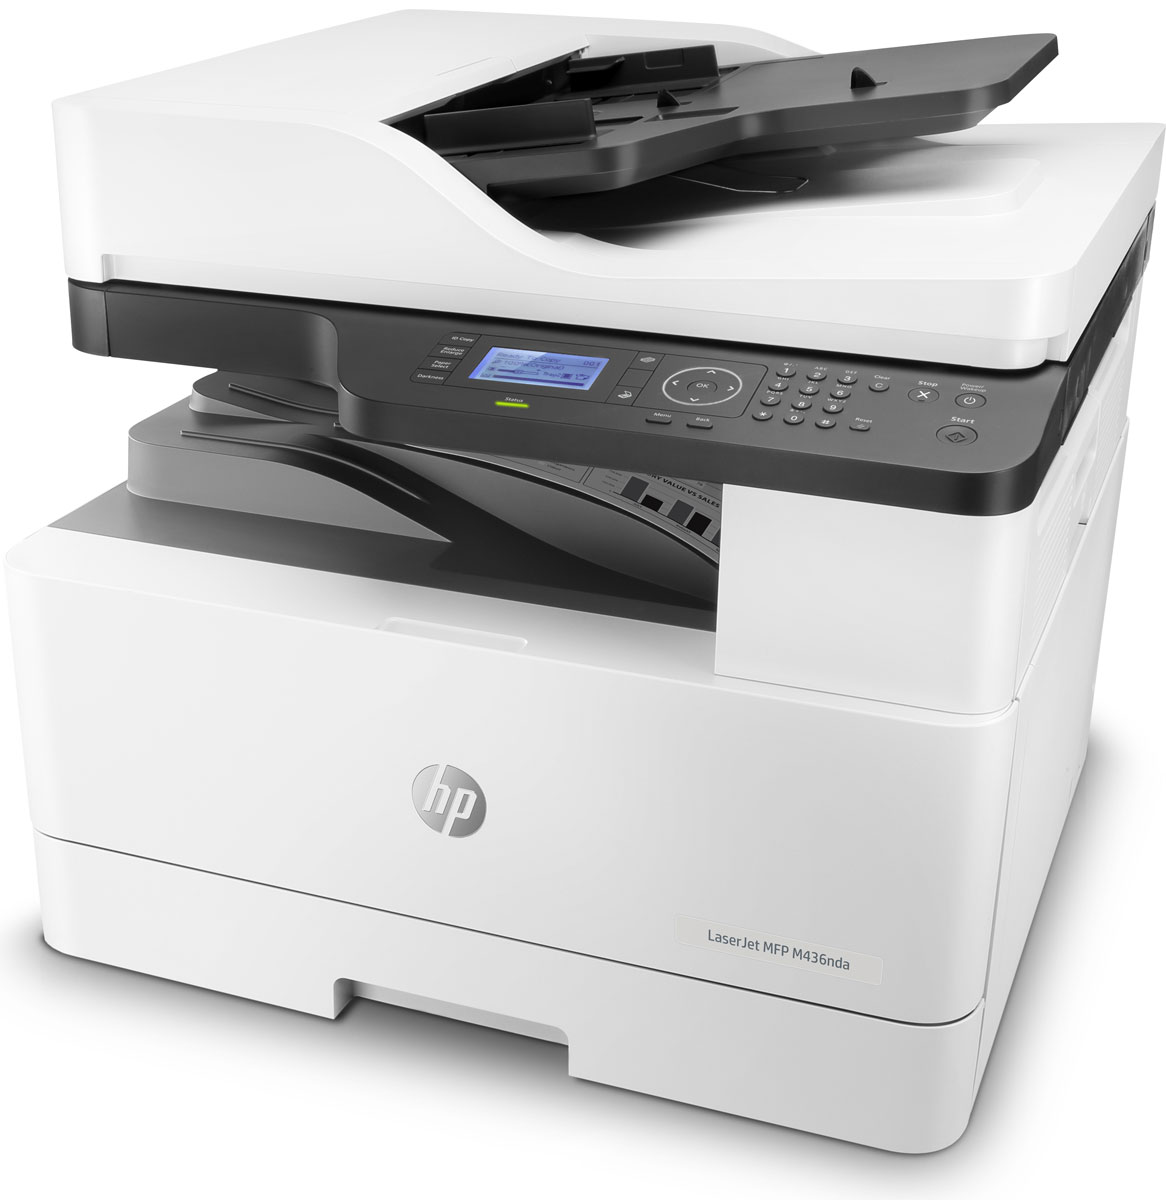 HP LaserJet M436nda МФУ мфу 127 hp